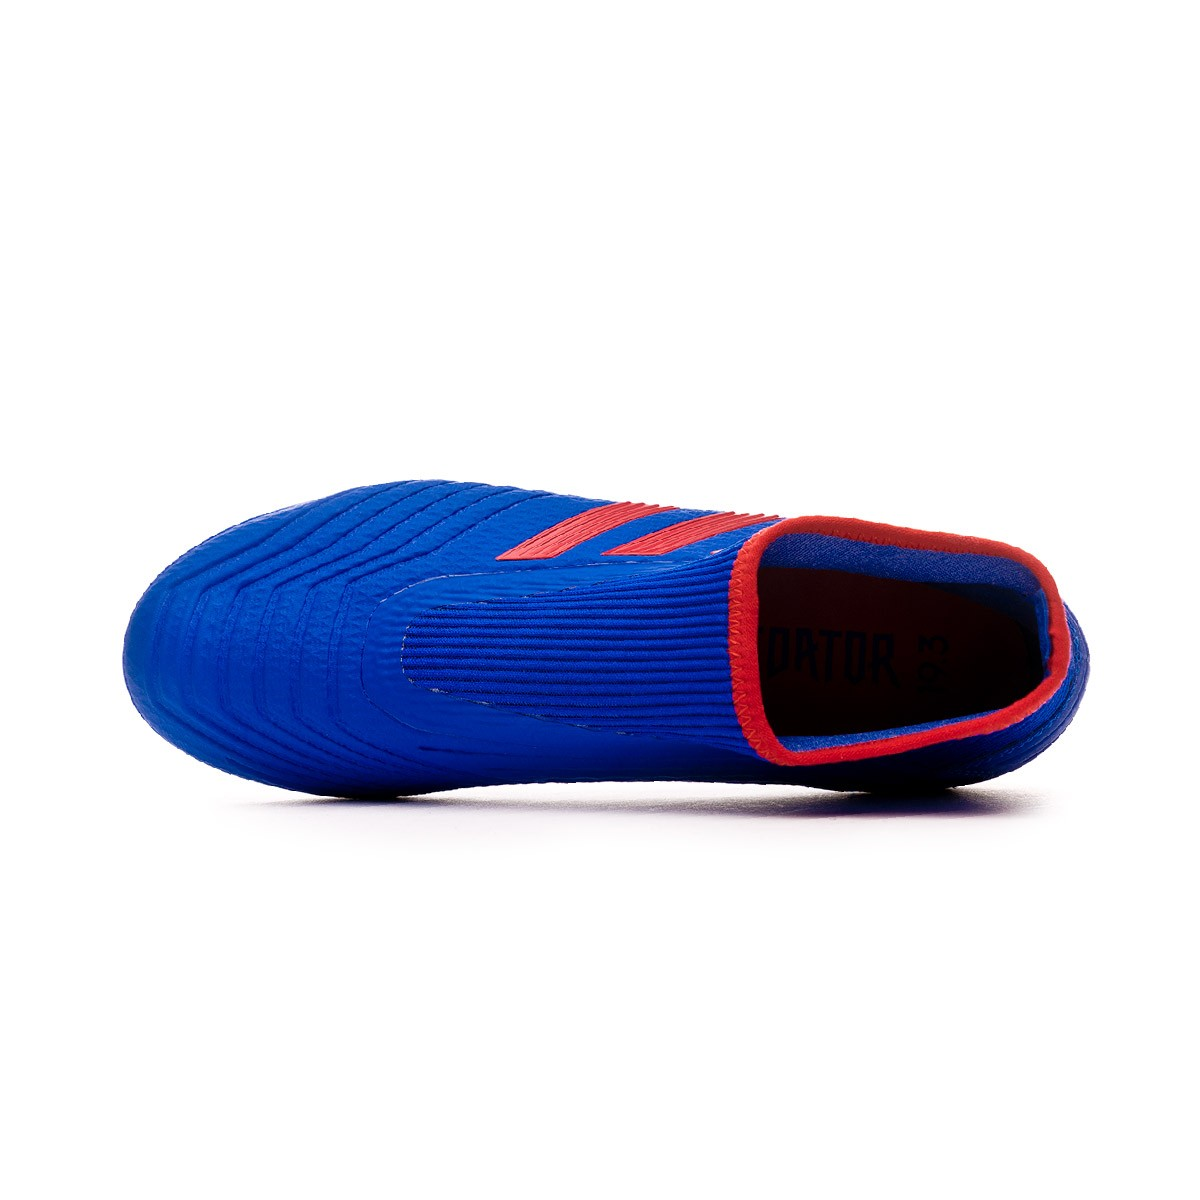 20c3e671023 Chuteira adidas Predator 19.3 FG LaceLess Bold blue-Active red-Silver  metallic - Loja de futebol Fútbol Emotion